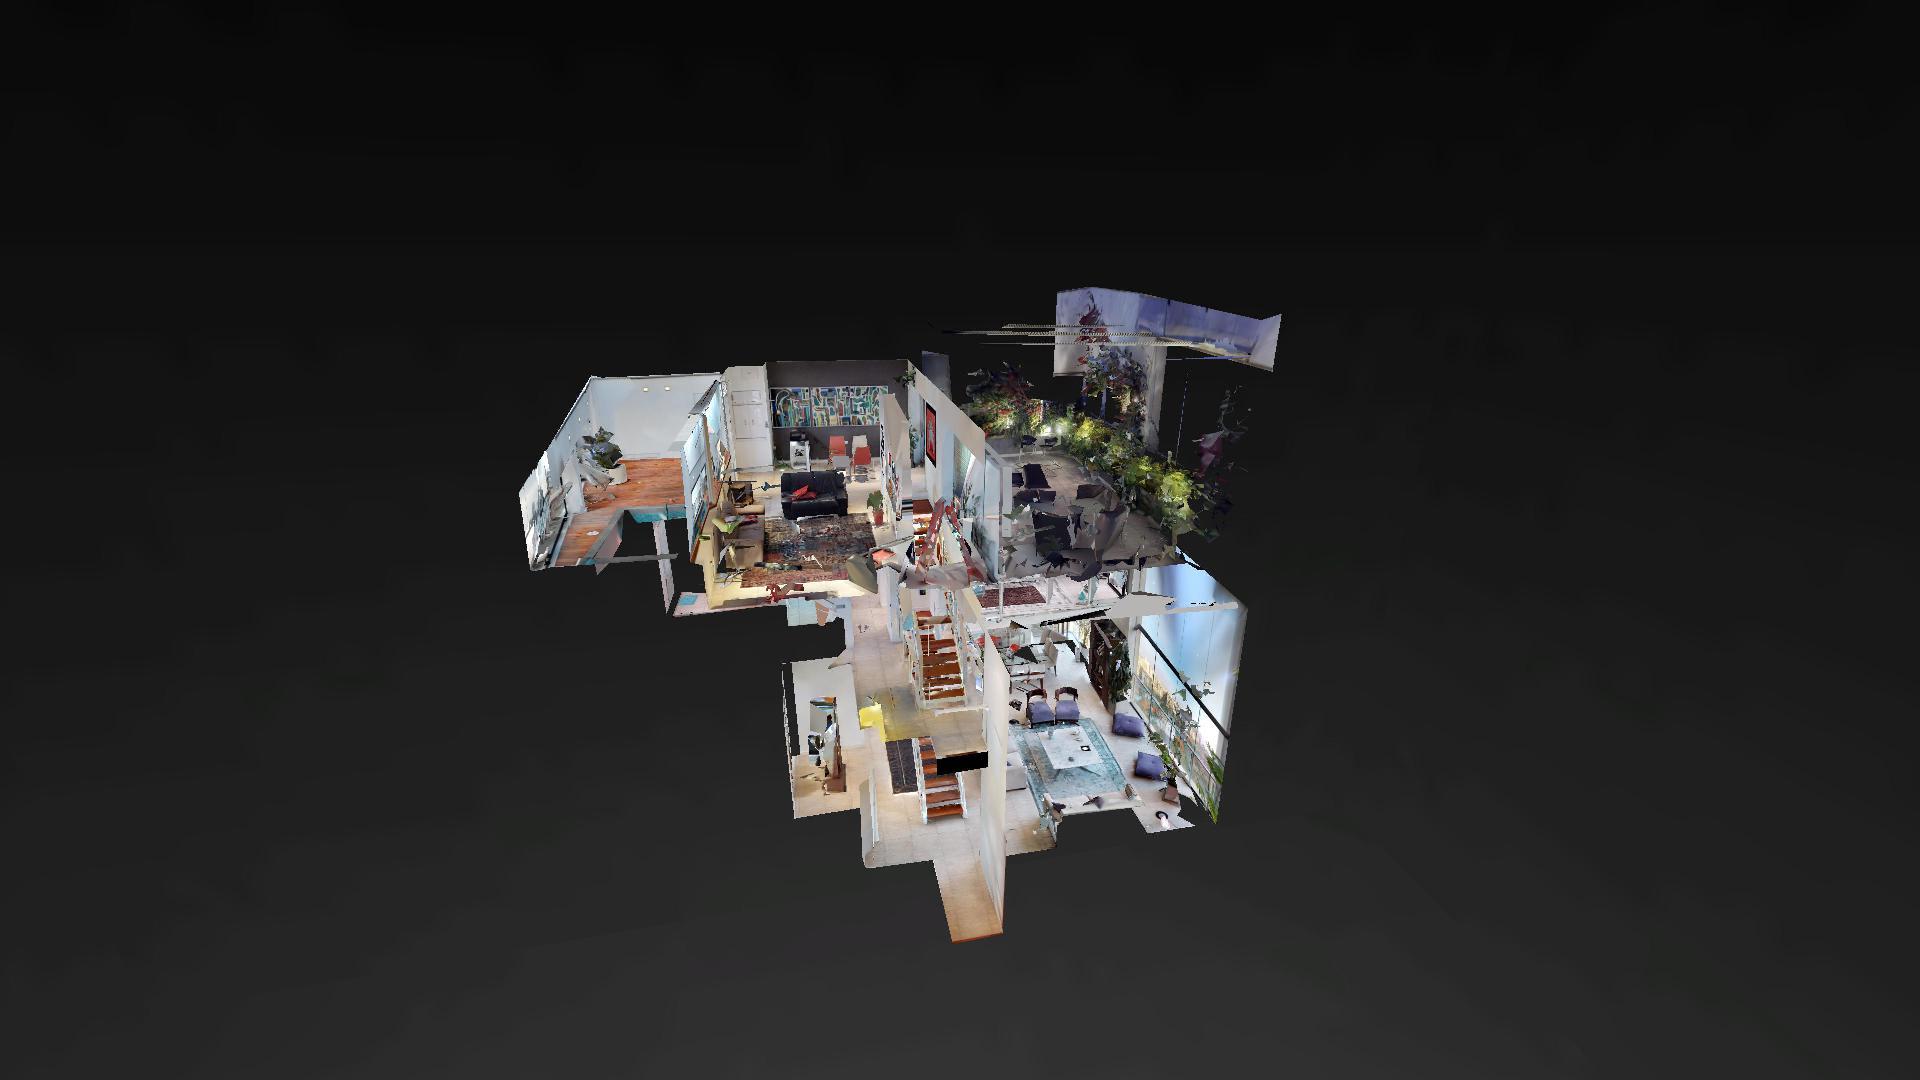 Recorrido virtual en la sala del penthouse malecon balta miraflores, Lima, Peru